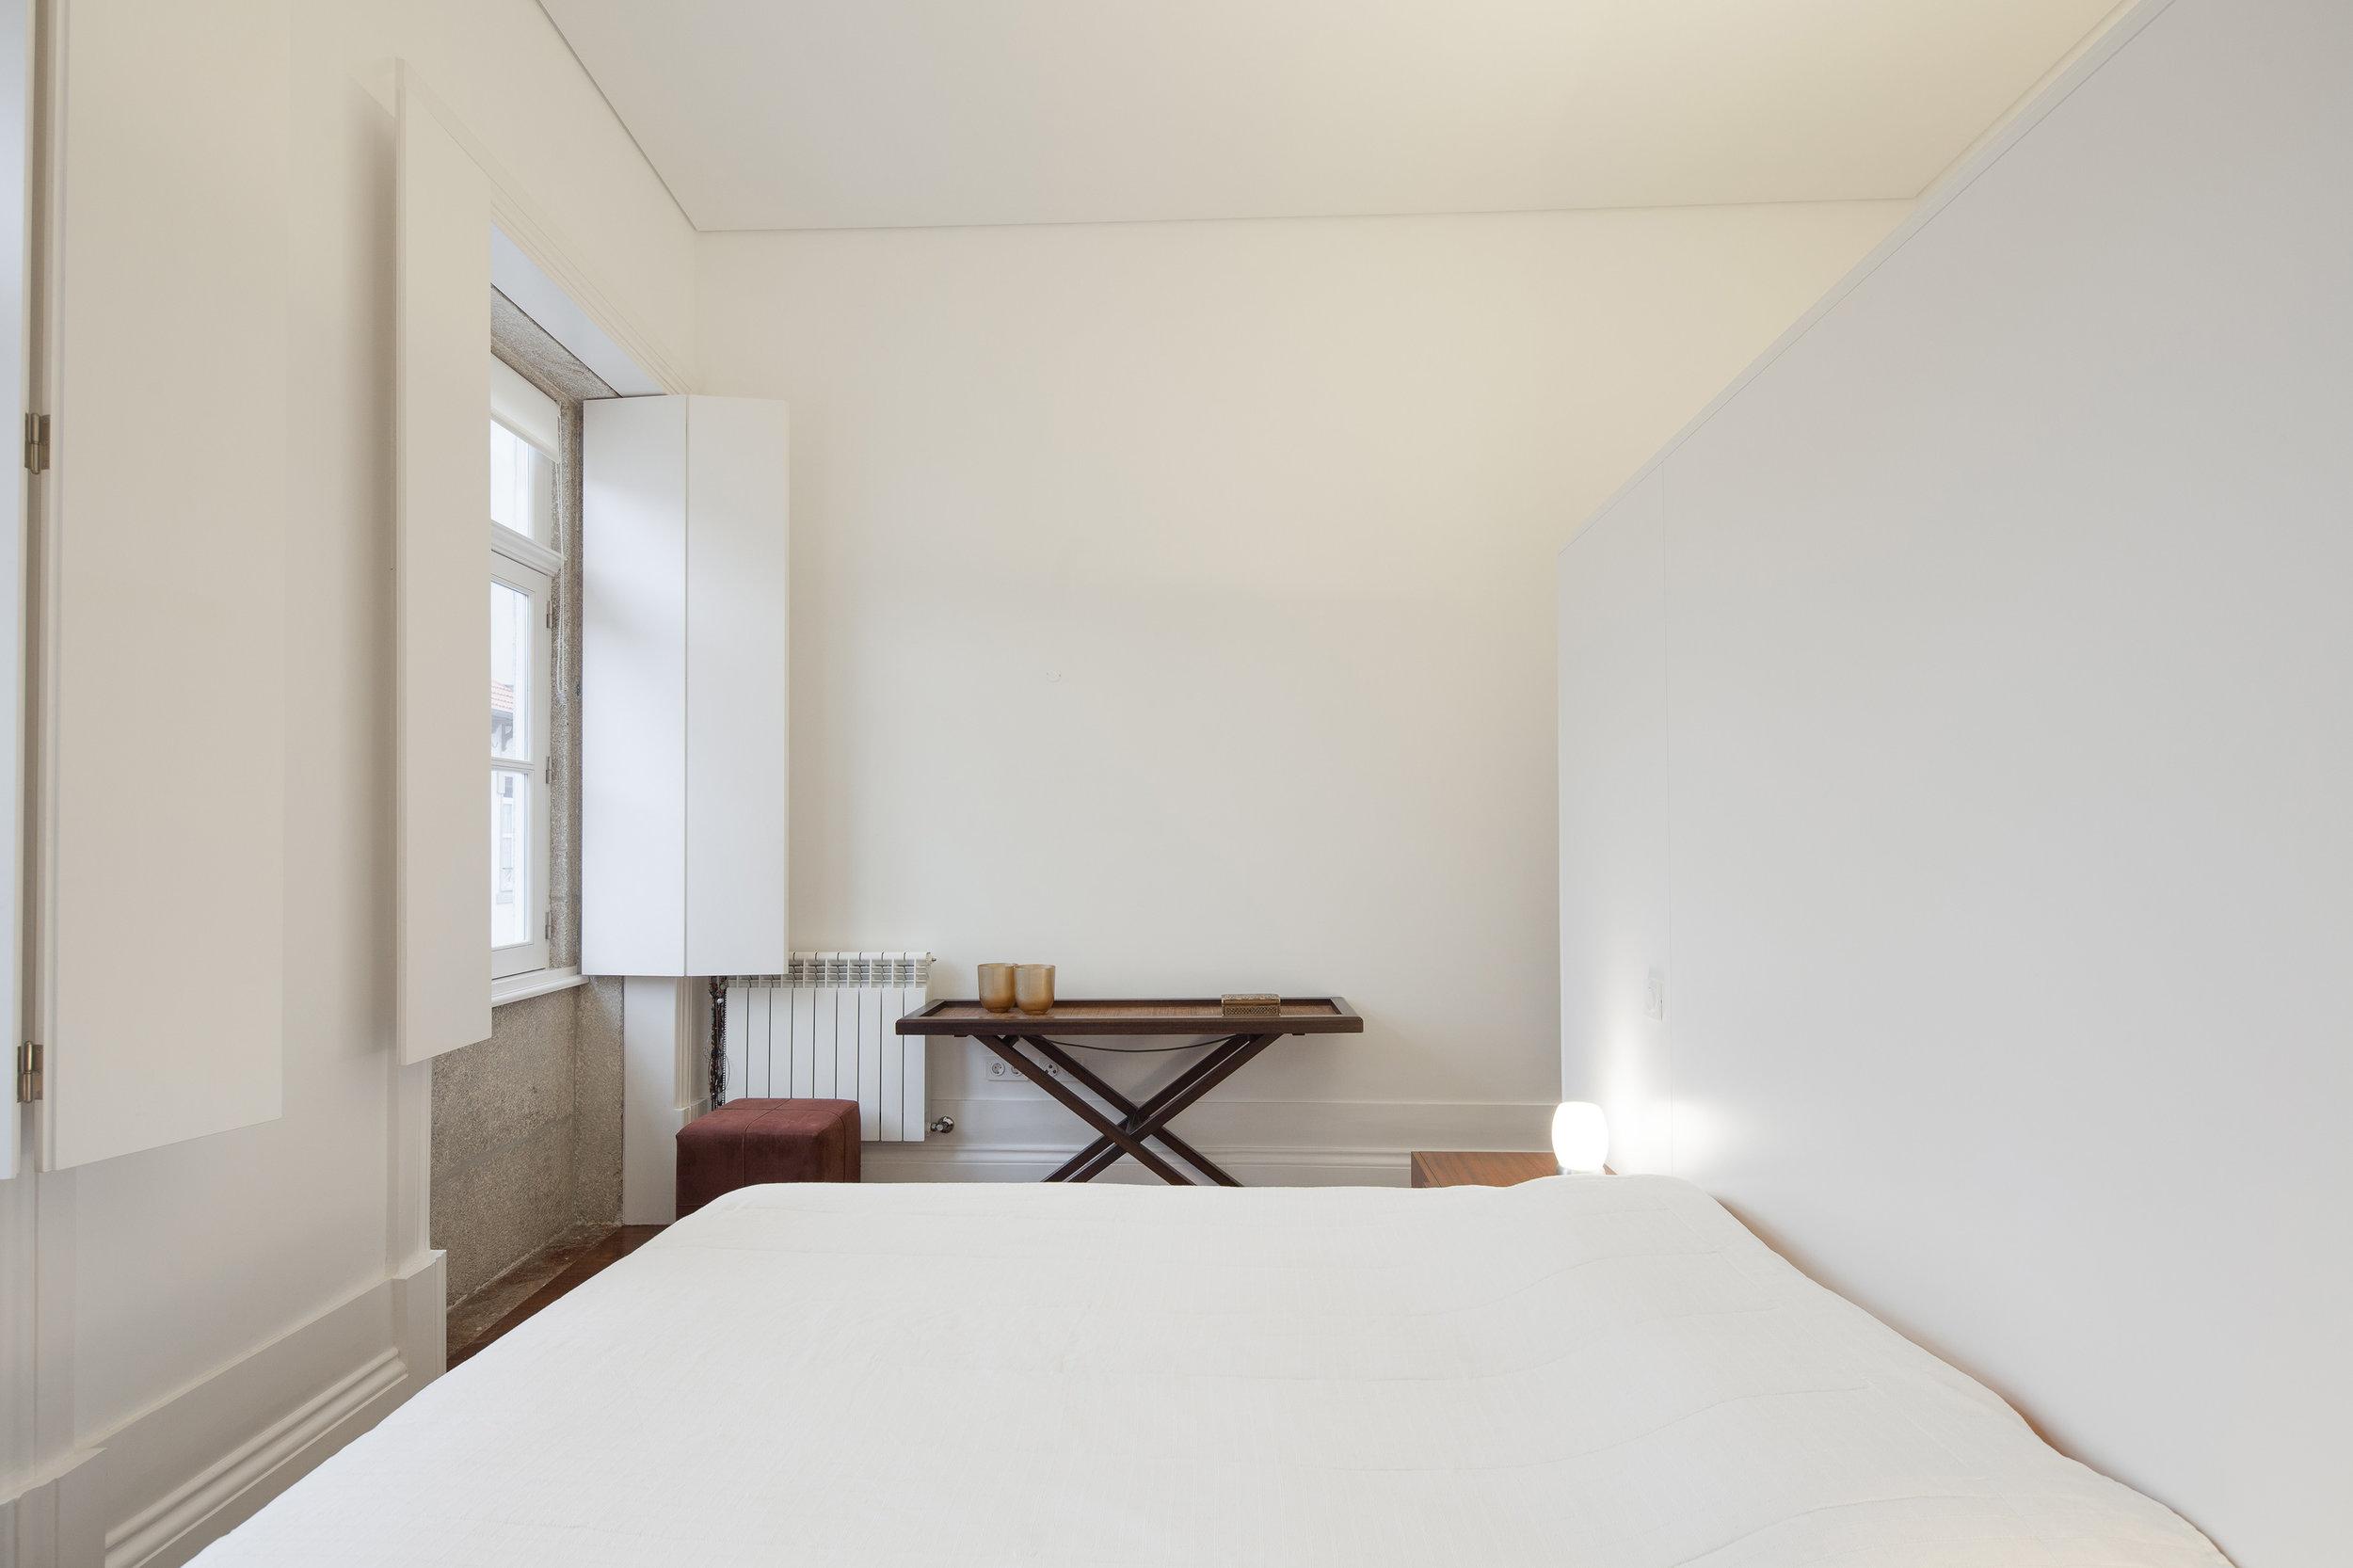 casa-pinheiro-manso-11